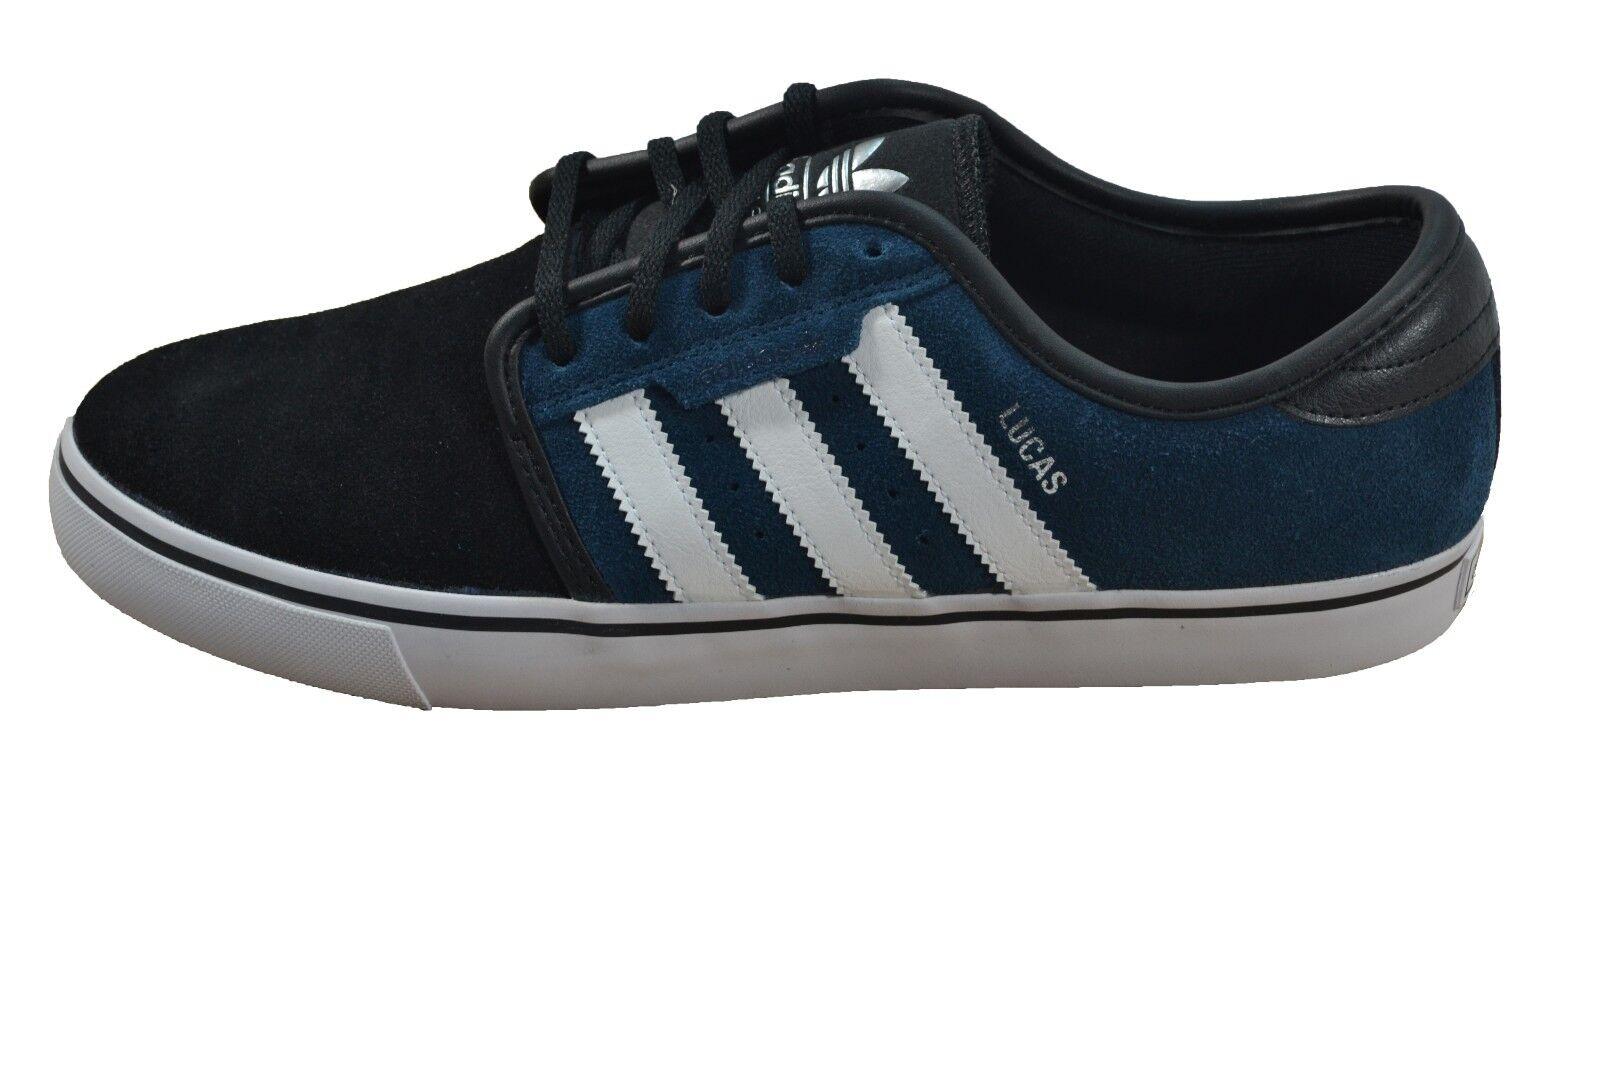 Adidas SEELEY Teal Black White C76422 Skateboarding (315) Skateboarding C76422 Men's Shoes 08a41c